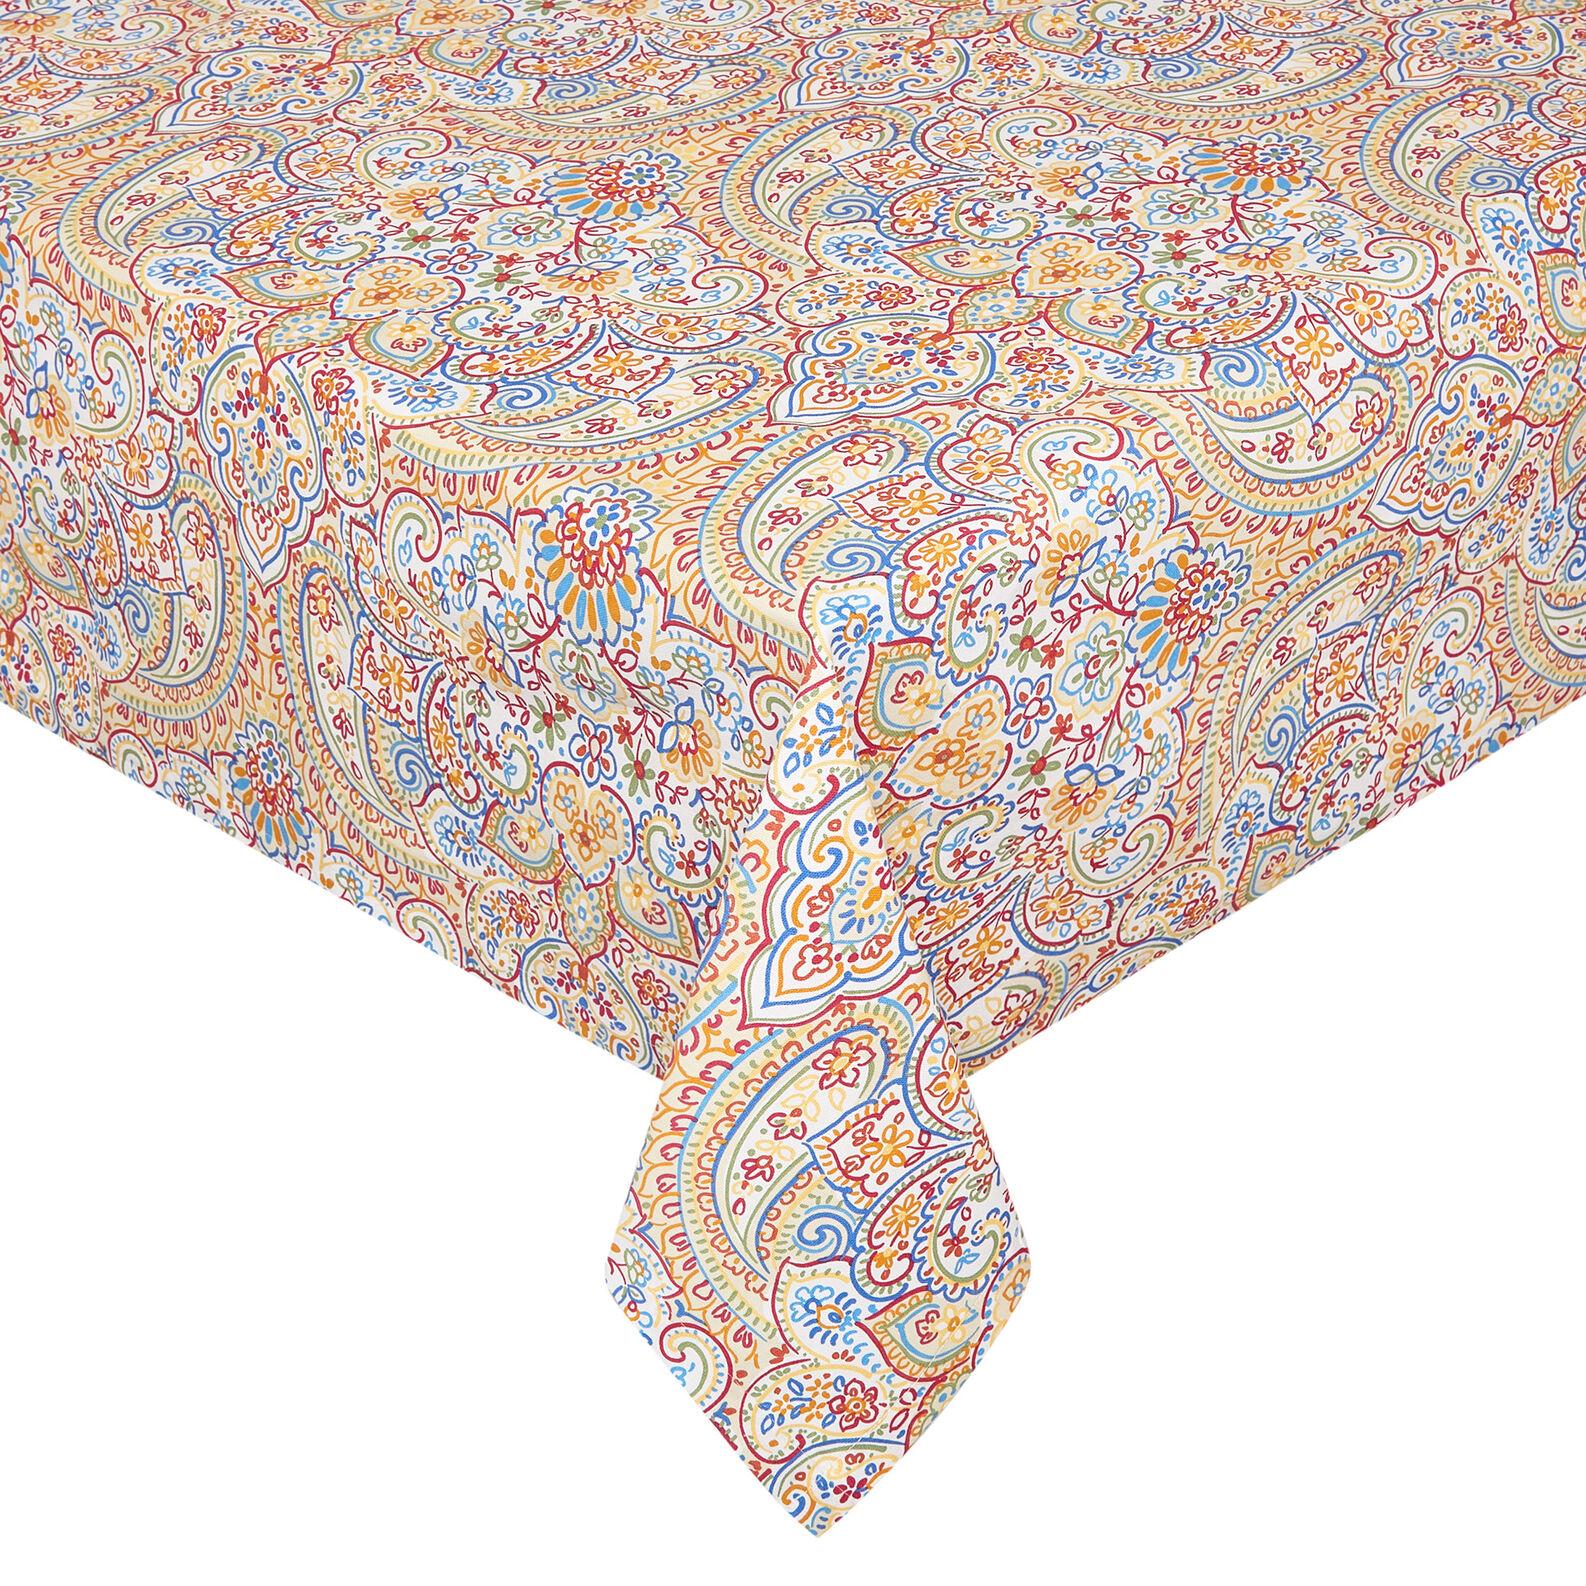 100% cotton tablecloth with mandala print